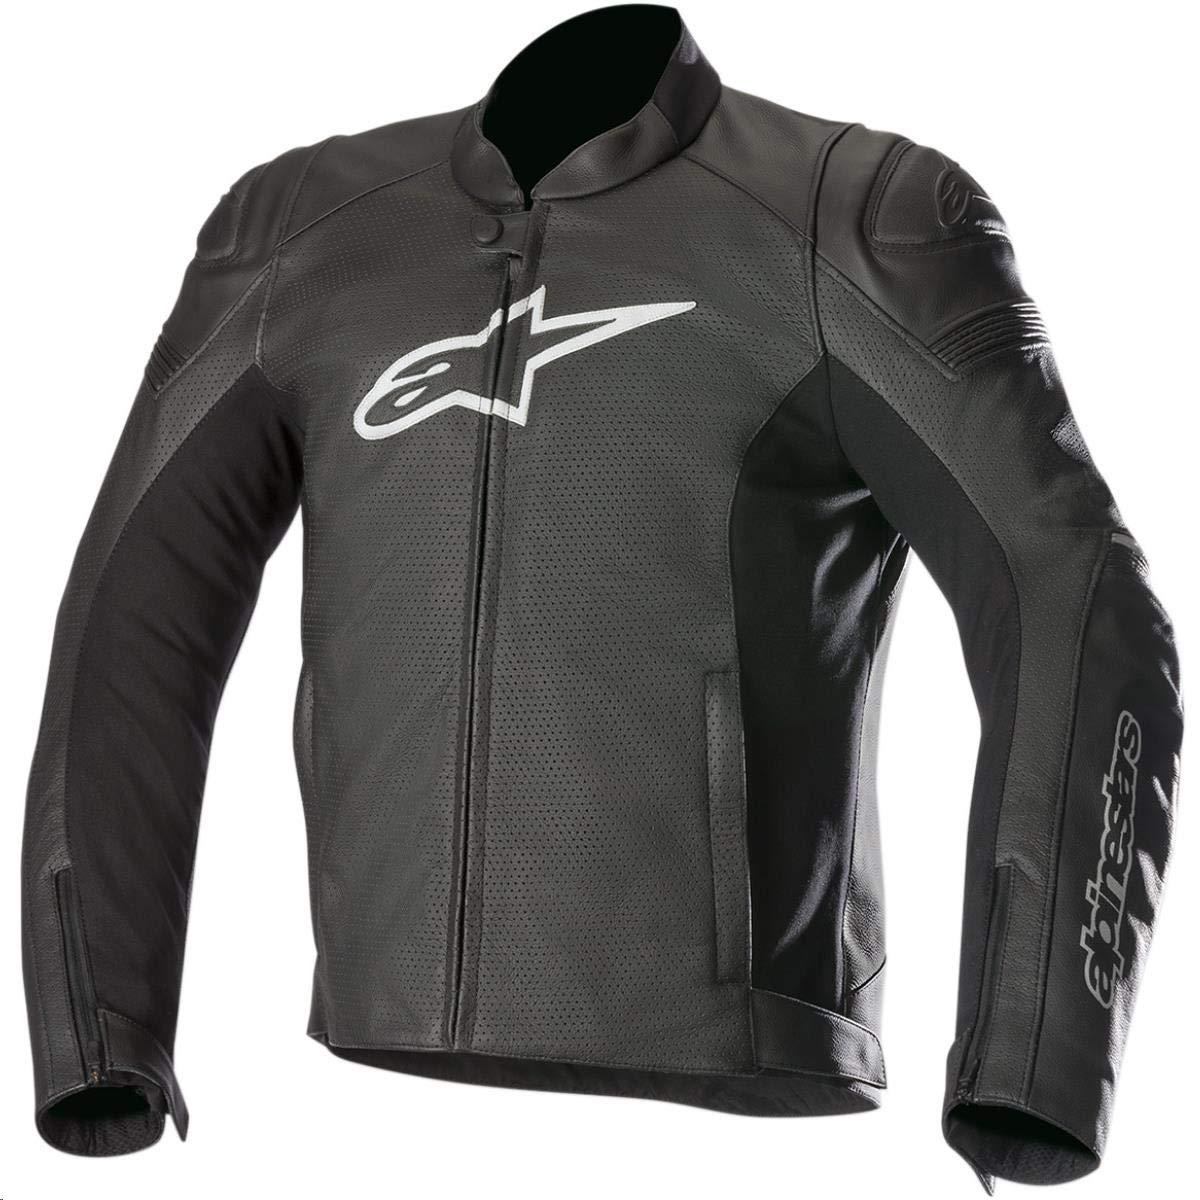 Alpinestars Sp-1 Airflow Mens Street Motorcycle Jackets Black 52 1692280152